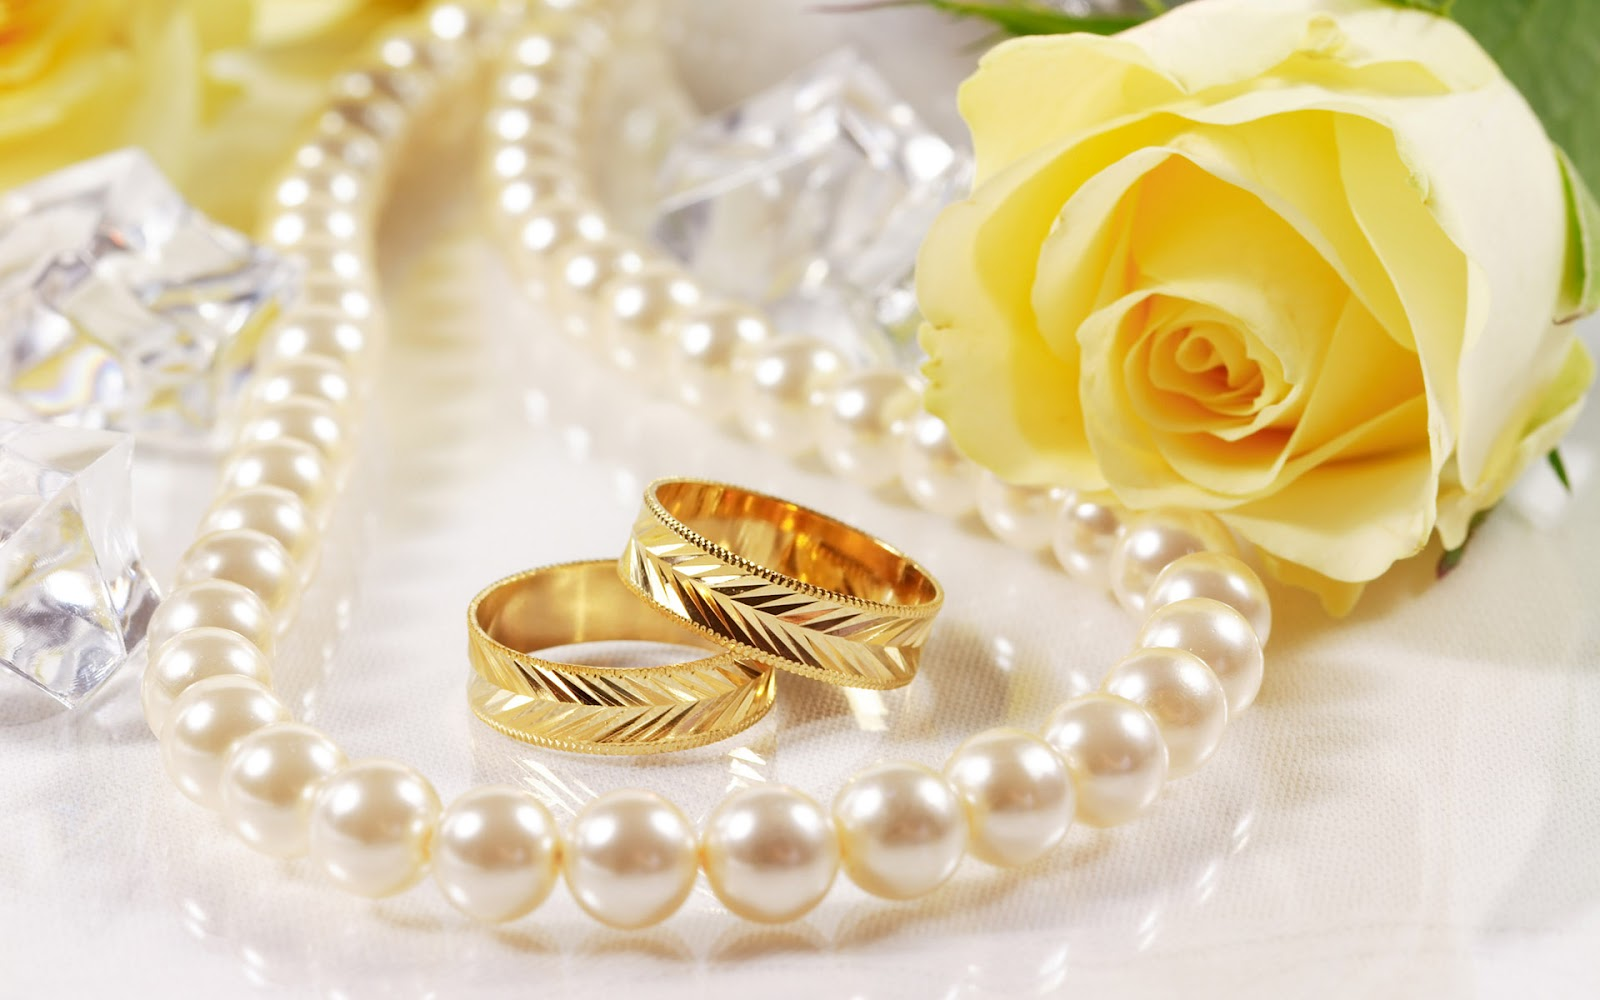 Auguri Felice Matrimonio : Felice day cartolina auguri matrimonio cuore augurio carta